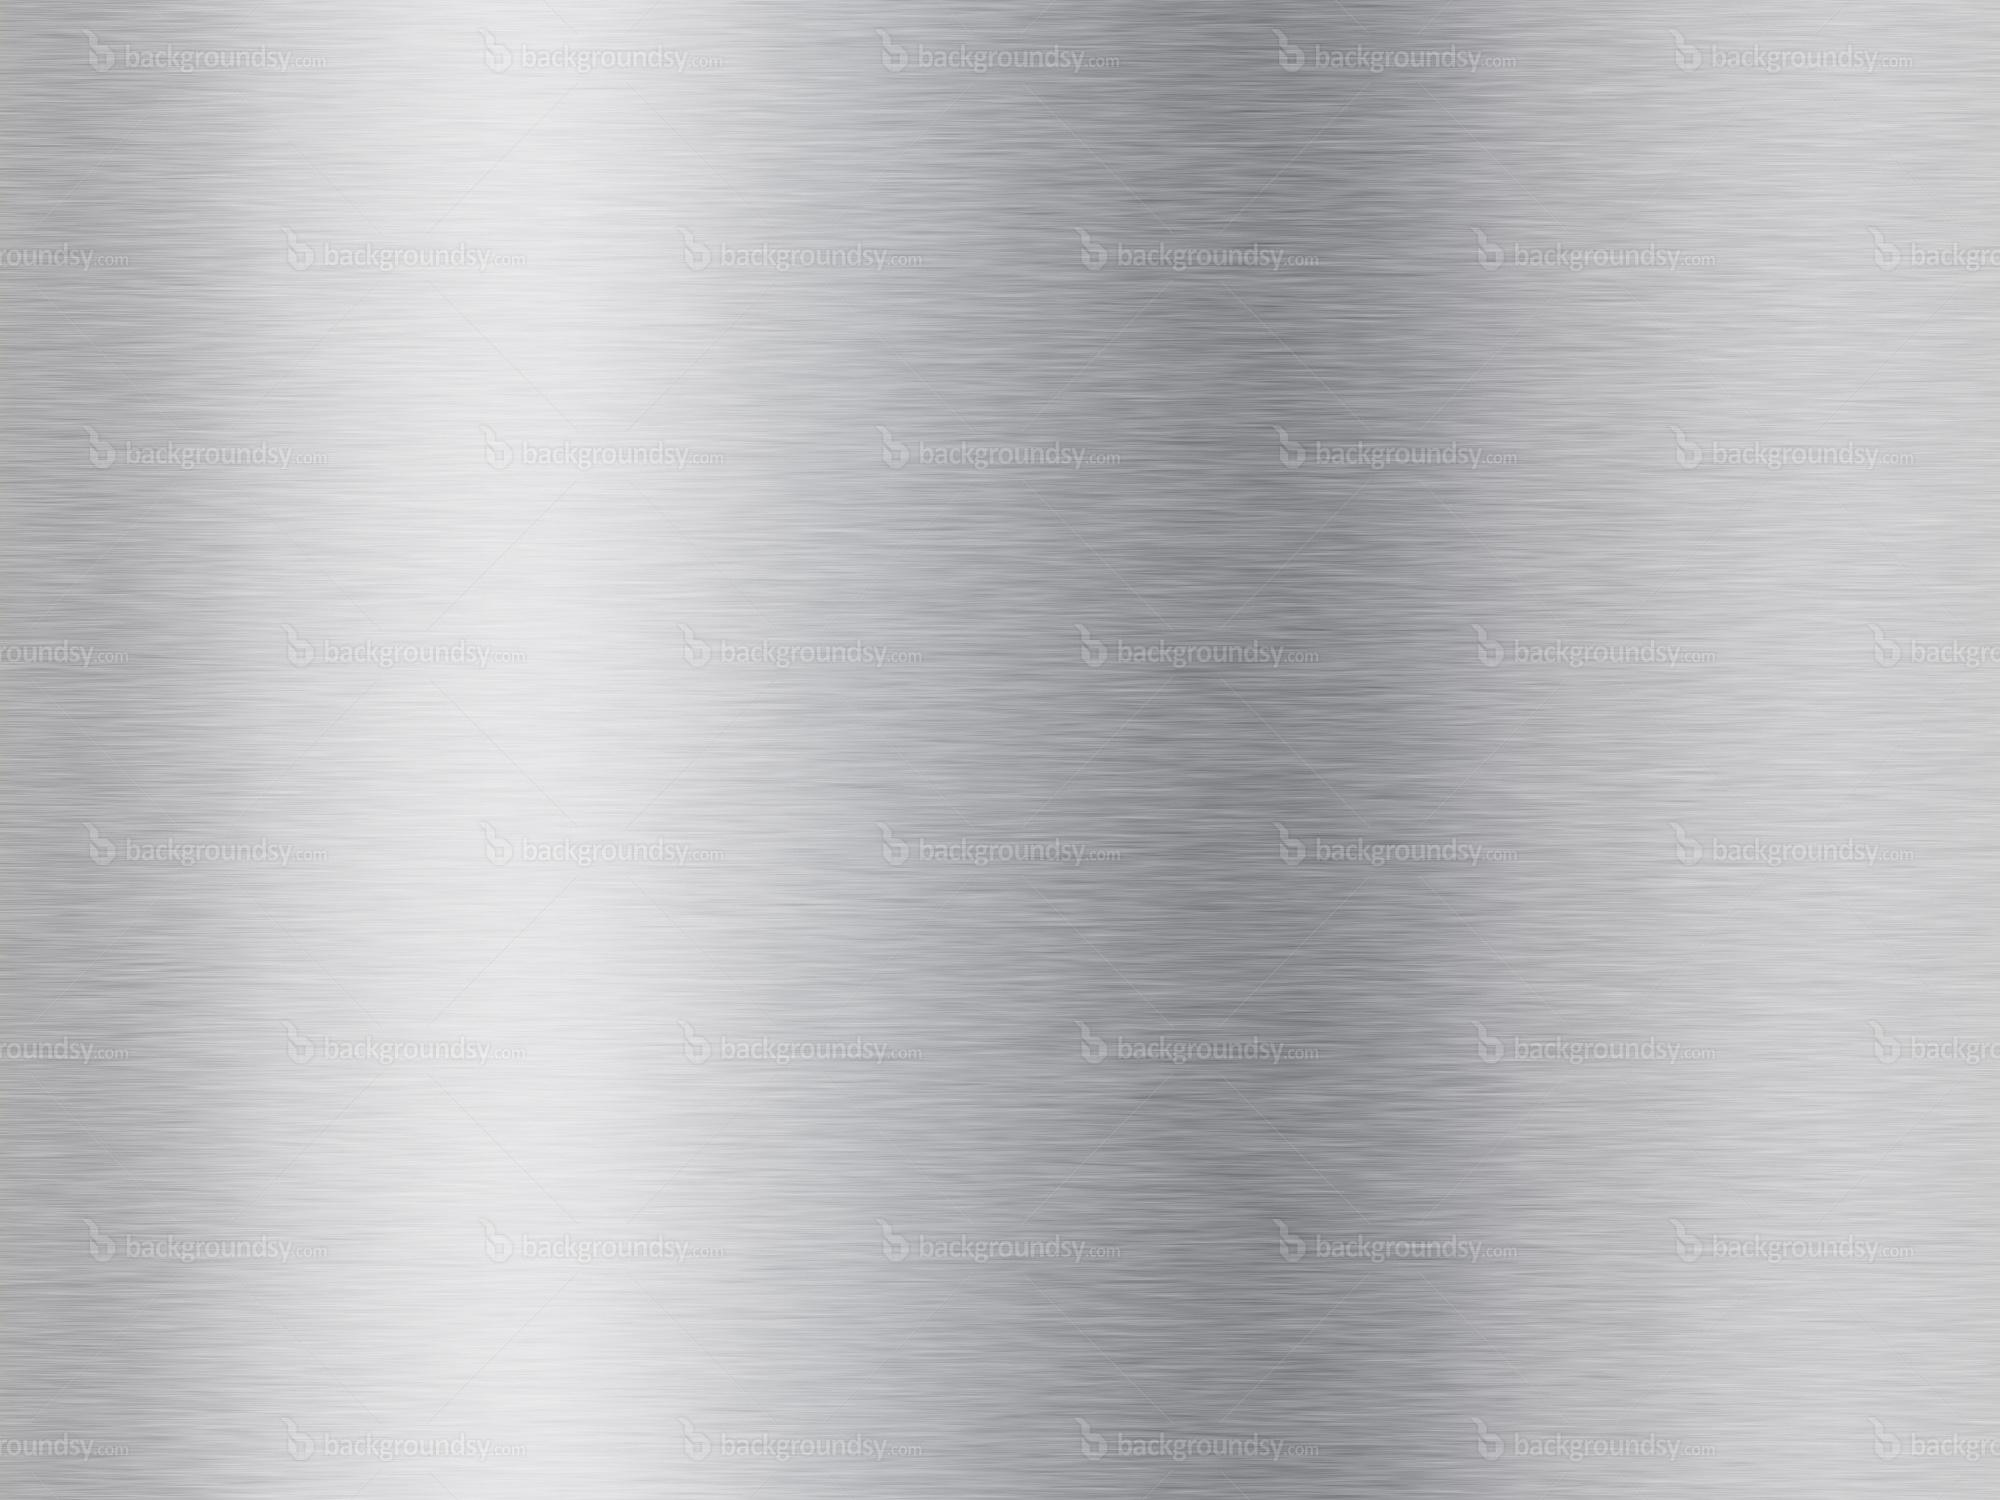 Shiny metallic silver background